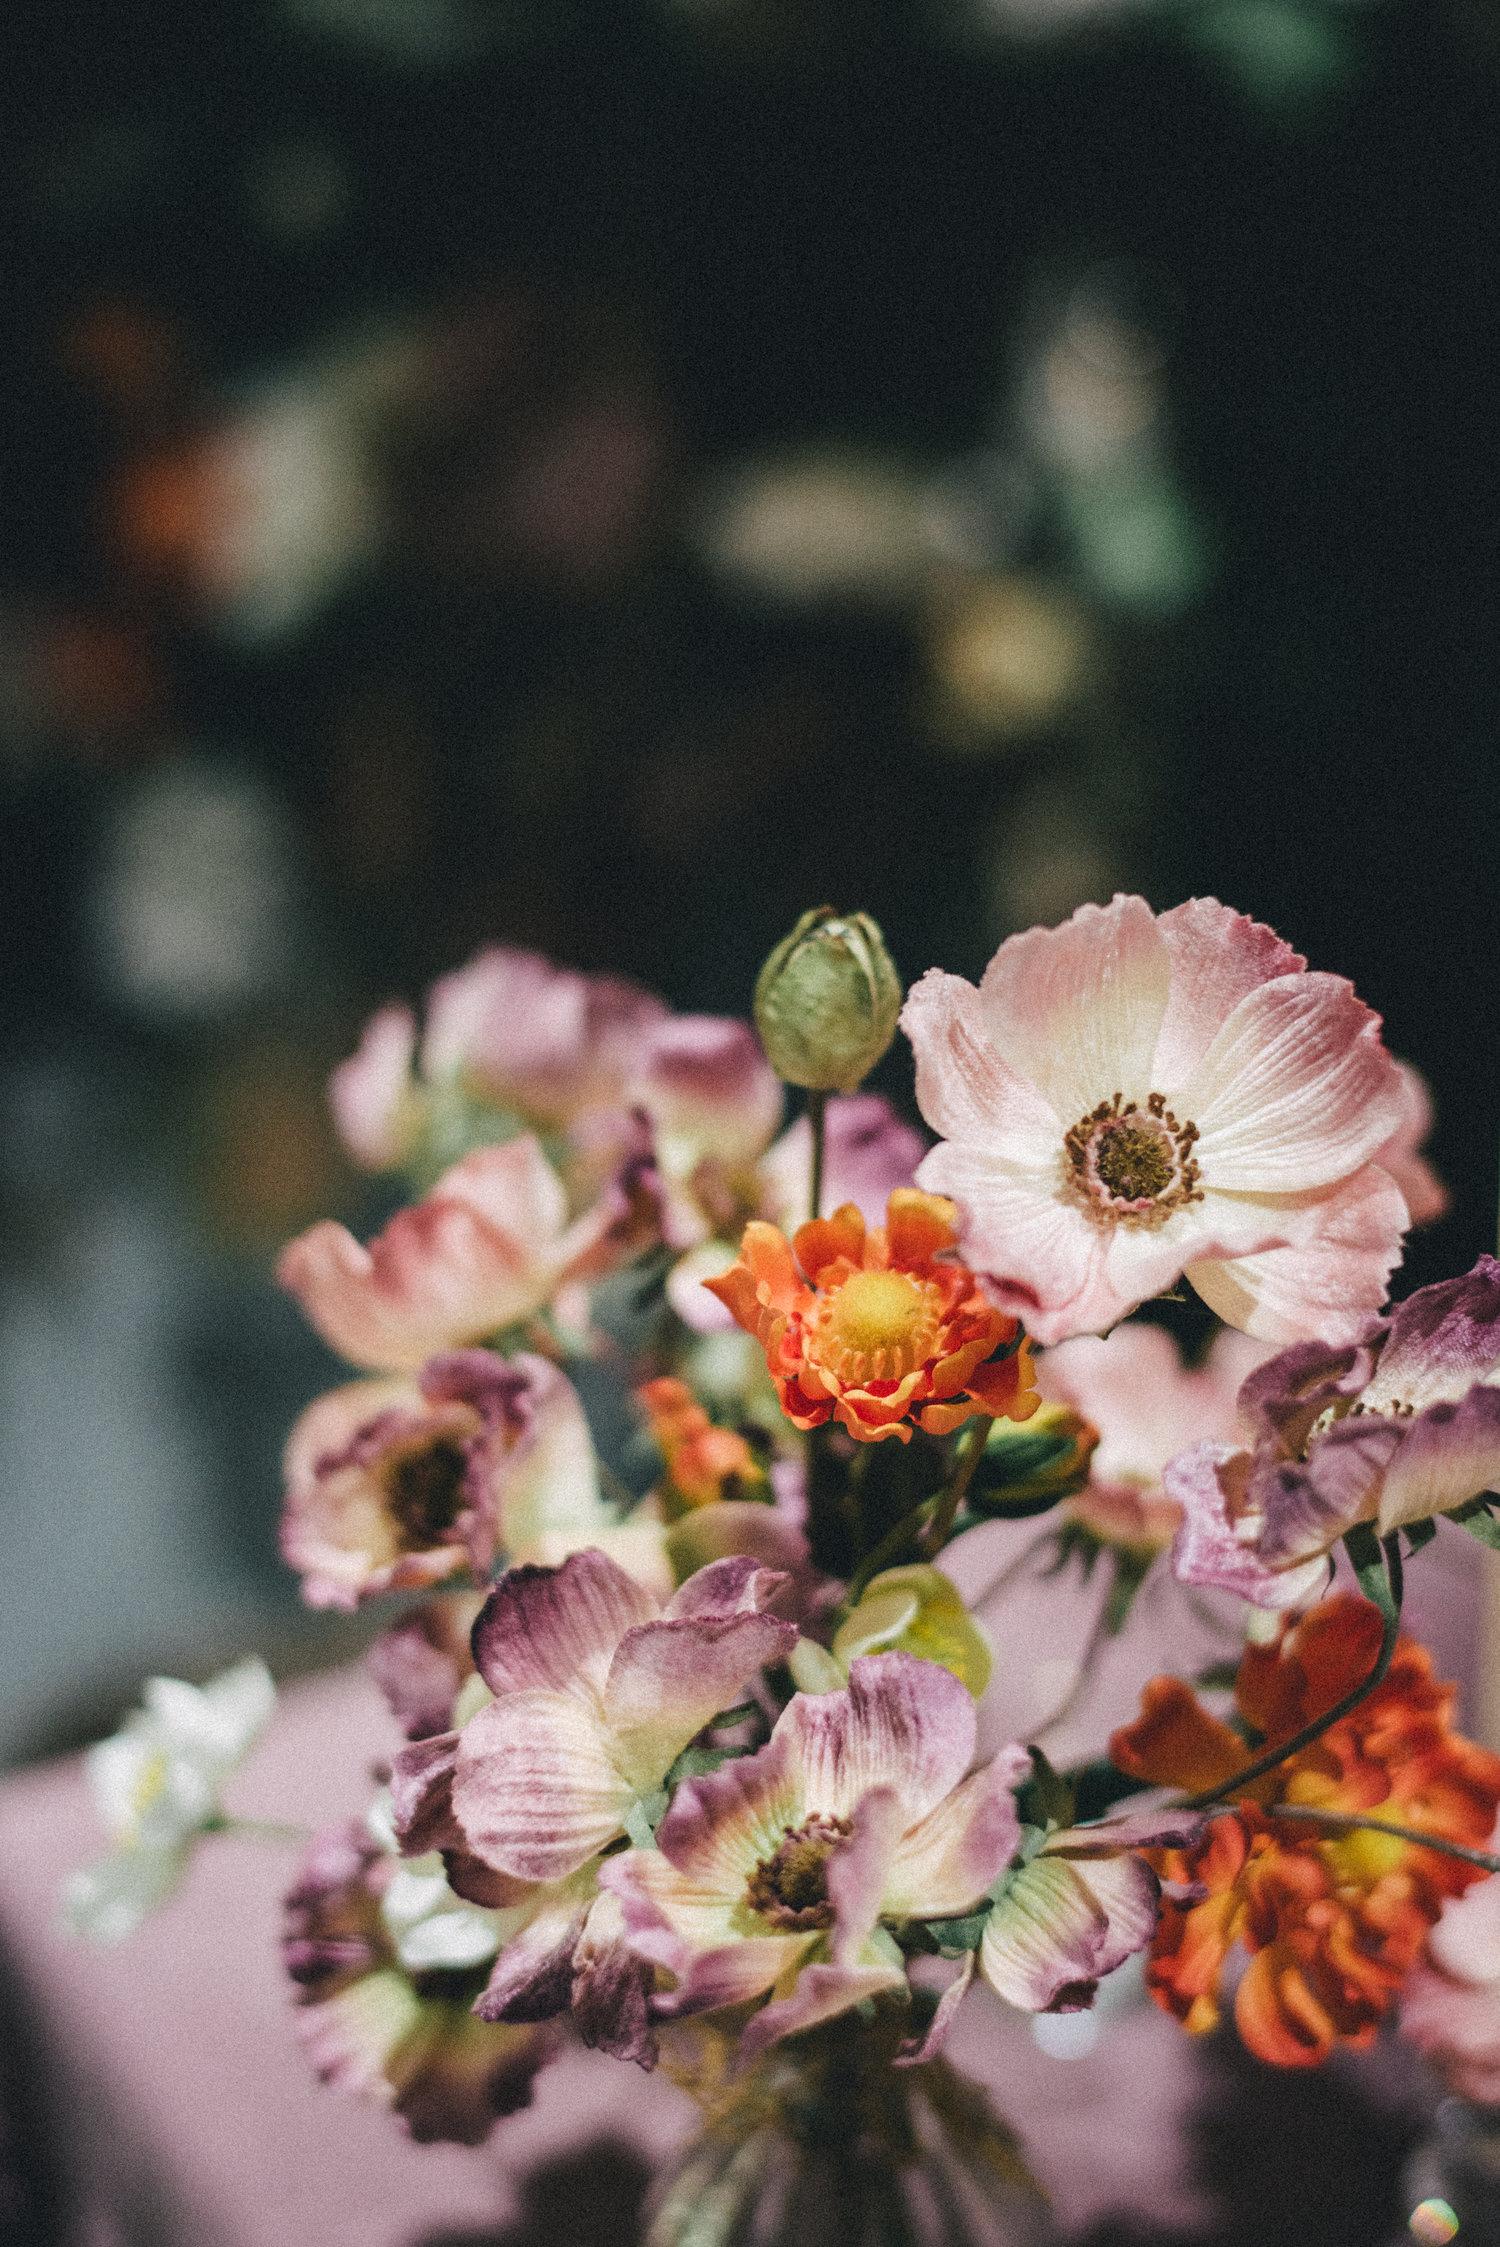 KITTEN GRAYSON FLOWERS